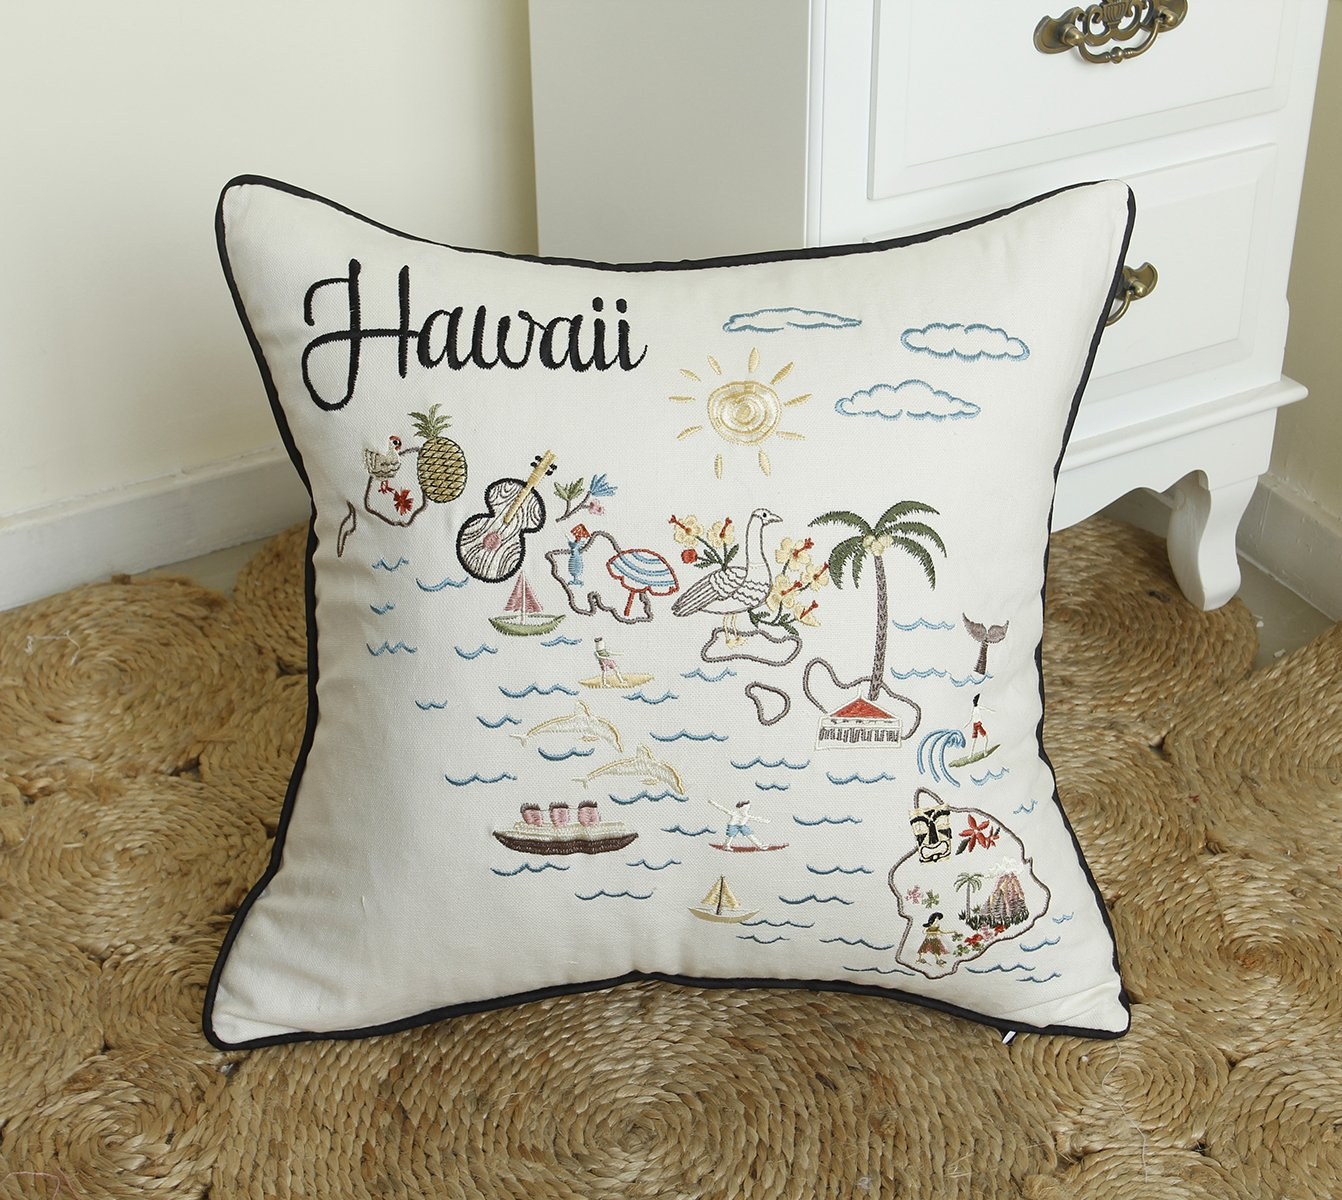 Hawaii Honolulu Hawaii Souvenir with Tiki Statue and Tropical Flowers - T-Shirts 3dRose Macdonald Creative Studios